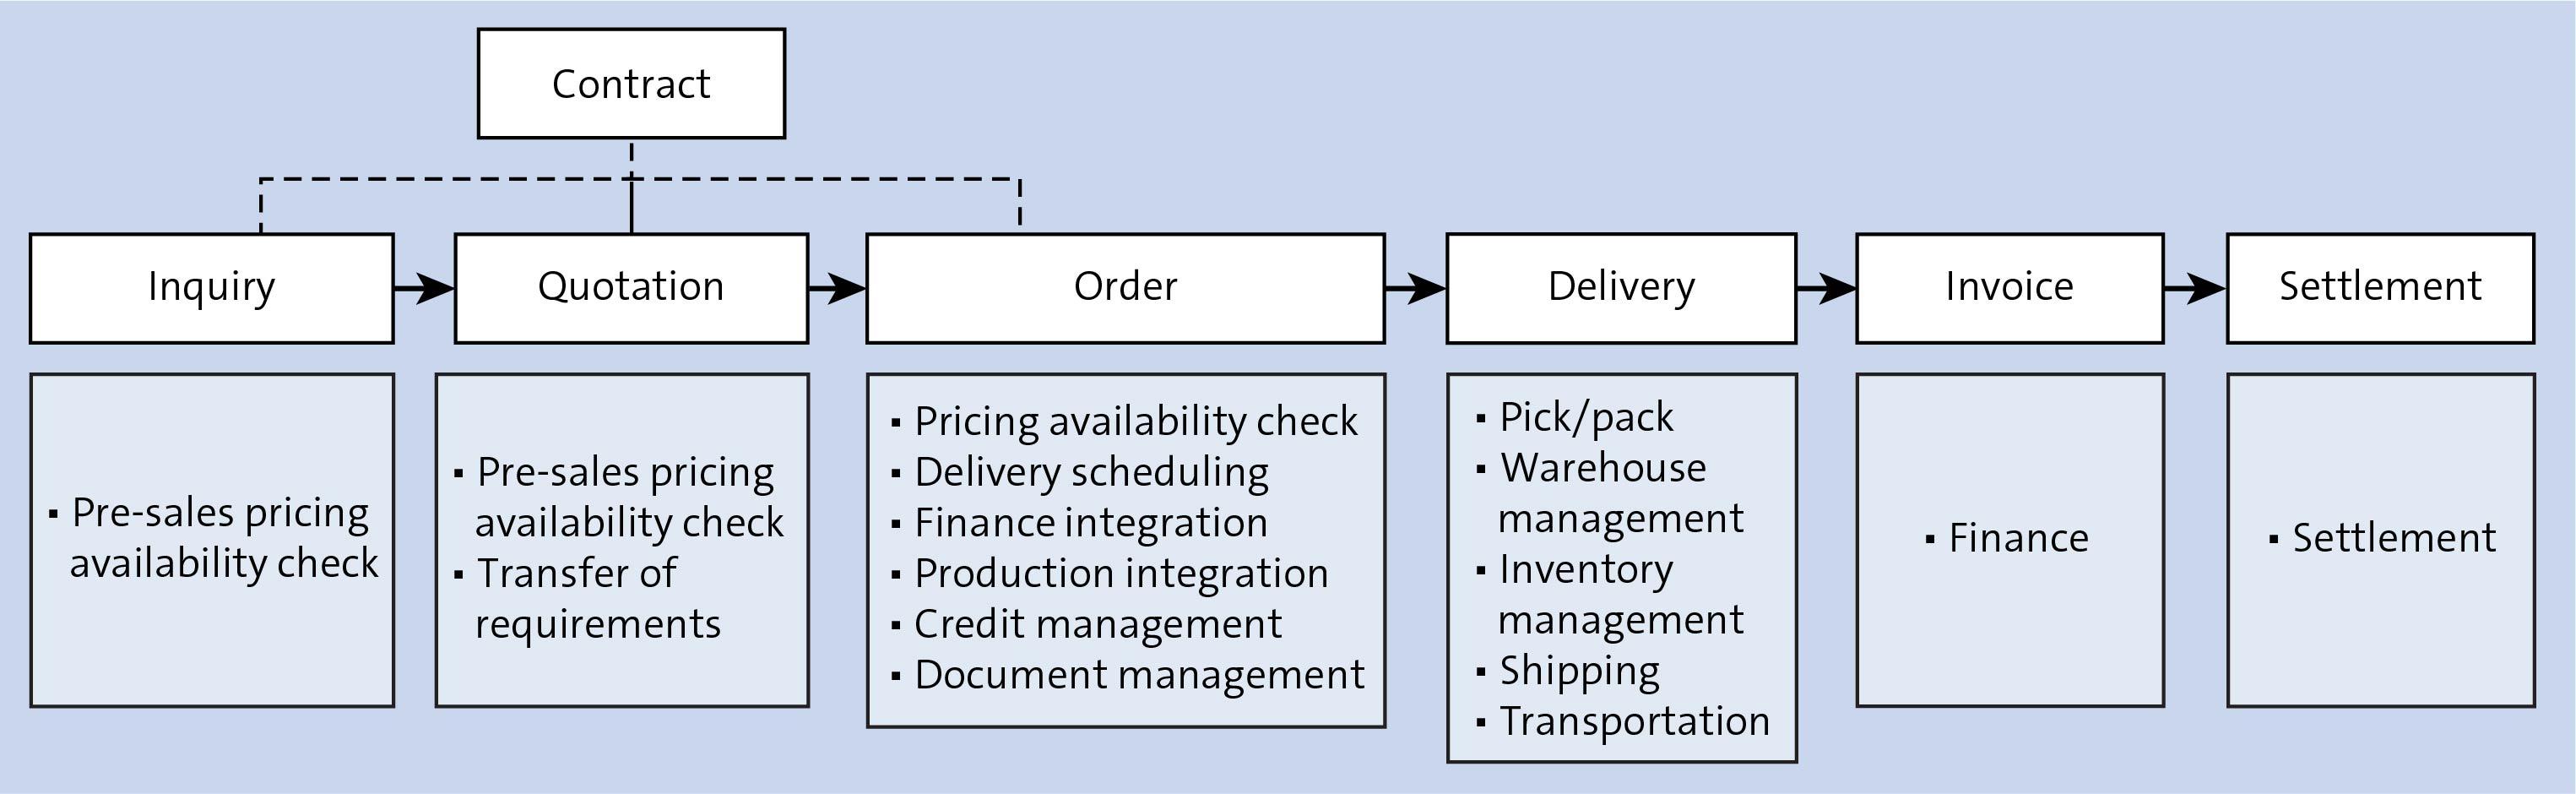 SAP Order-to-Cash Process